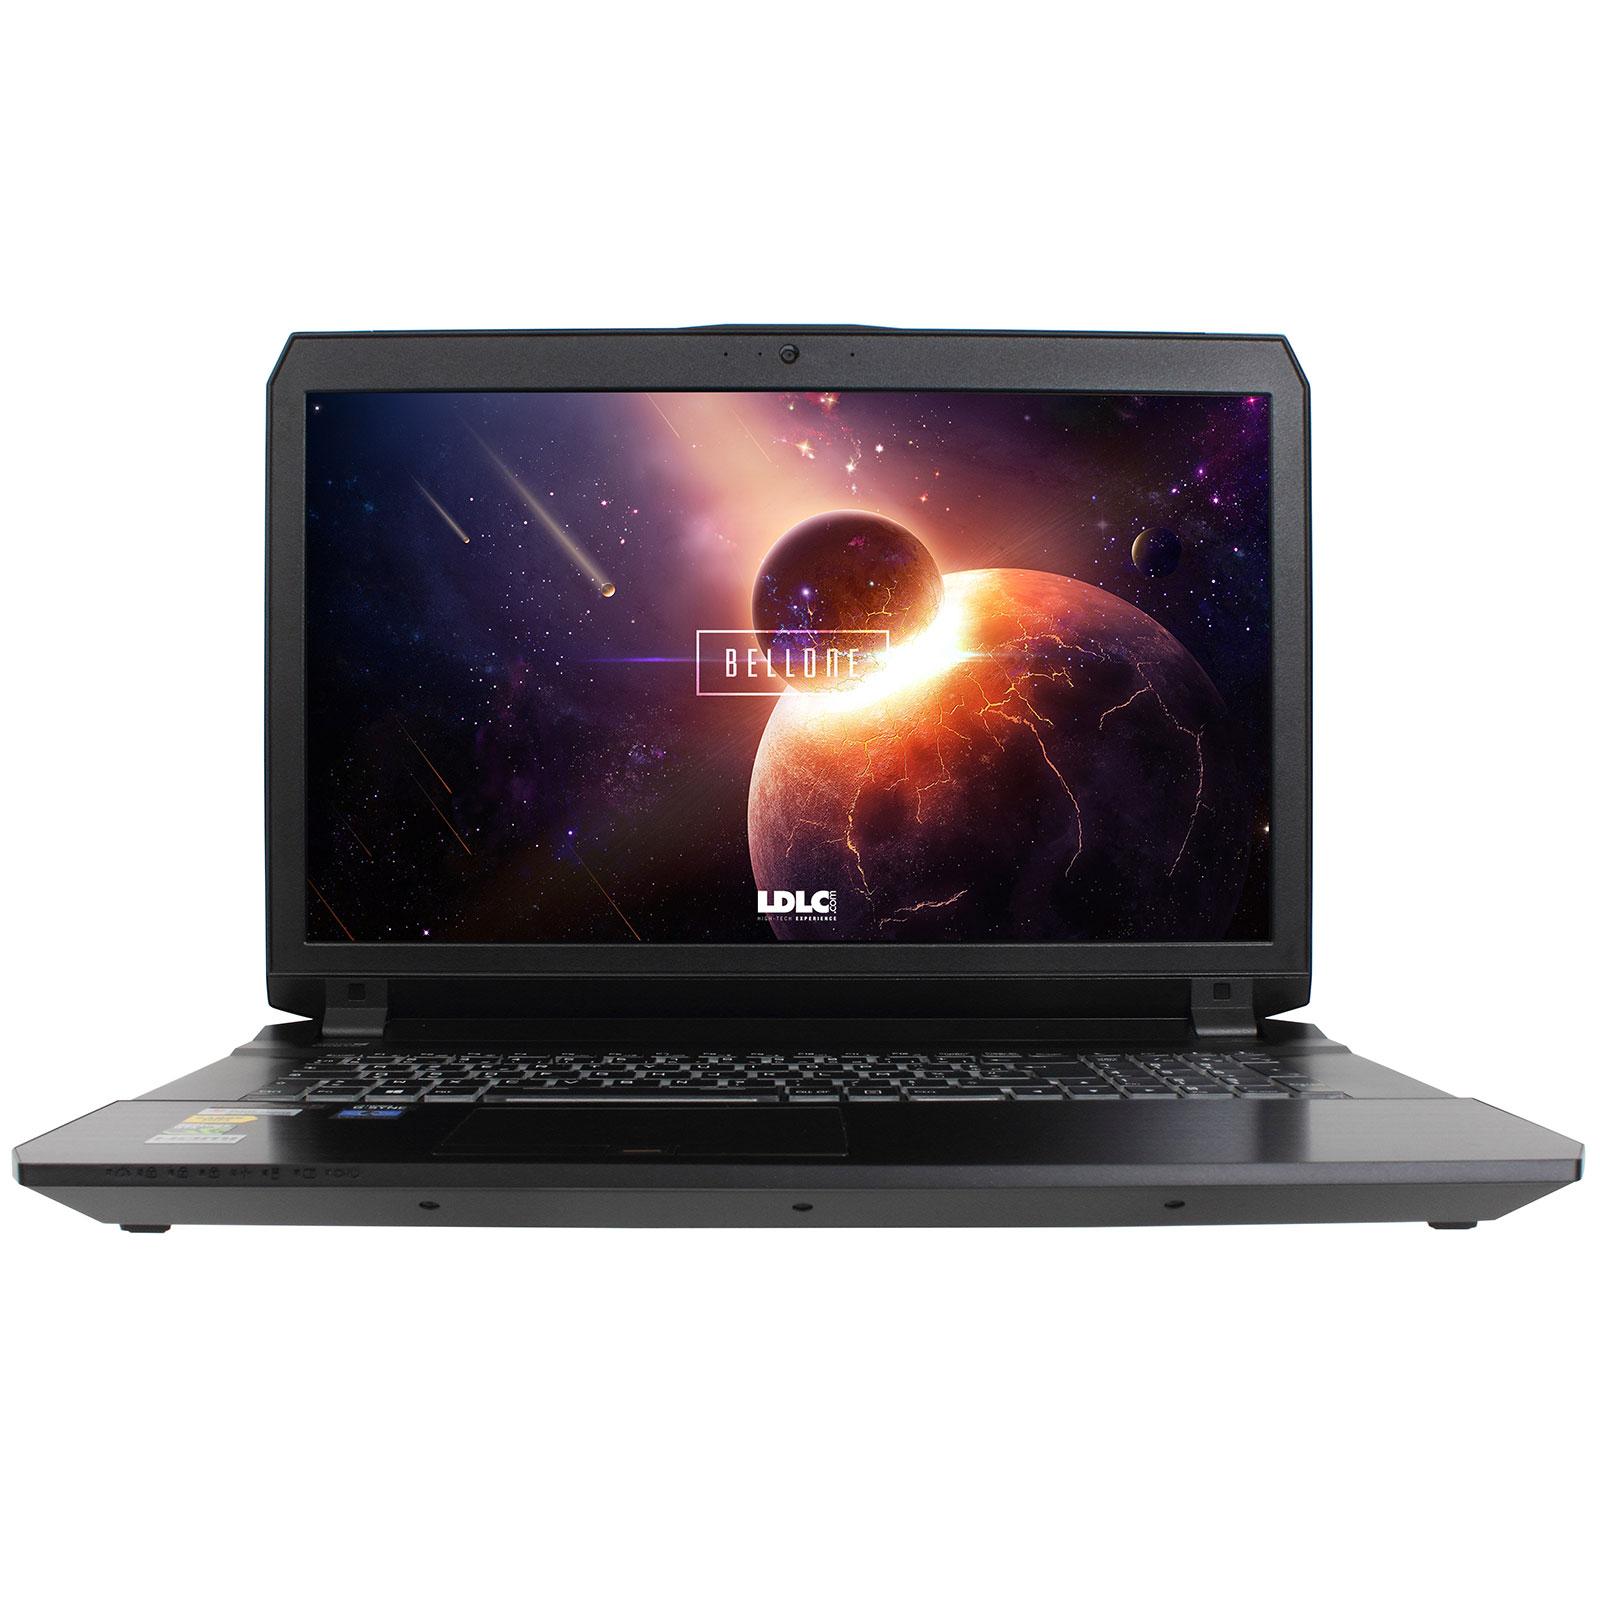 "PC portable LDLC Bellone Z70B-I7-32-H40S10-P10 Intel Core i7-6700HQ 32 Go SSD 1 To + HDD 4 To (2x 2 To) 17.3"" LED Full HD G-SYNC NVIDIA GeForce GTX 1070 8 Go Wi-Fi N/Bluetooth Webcam Windows 10 Professionnel 64 bits"